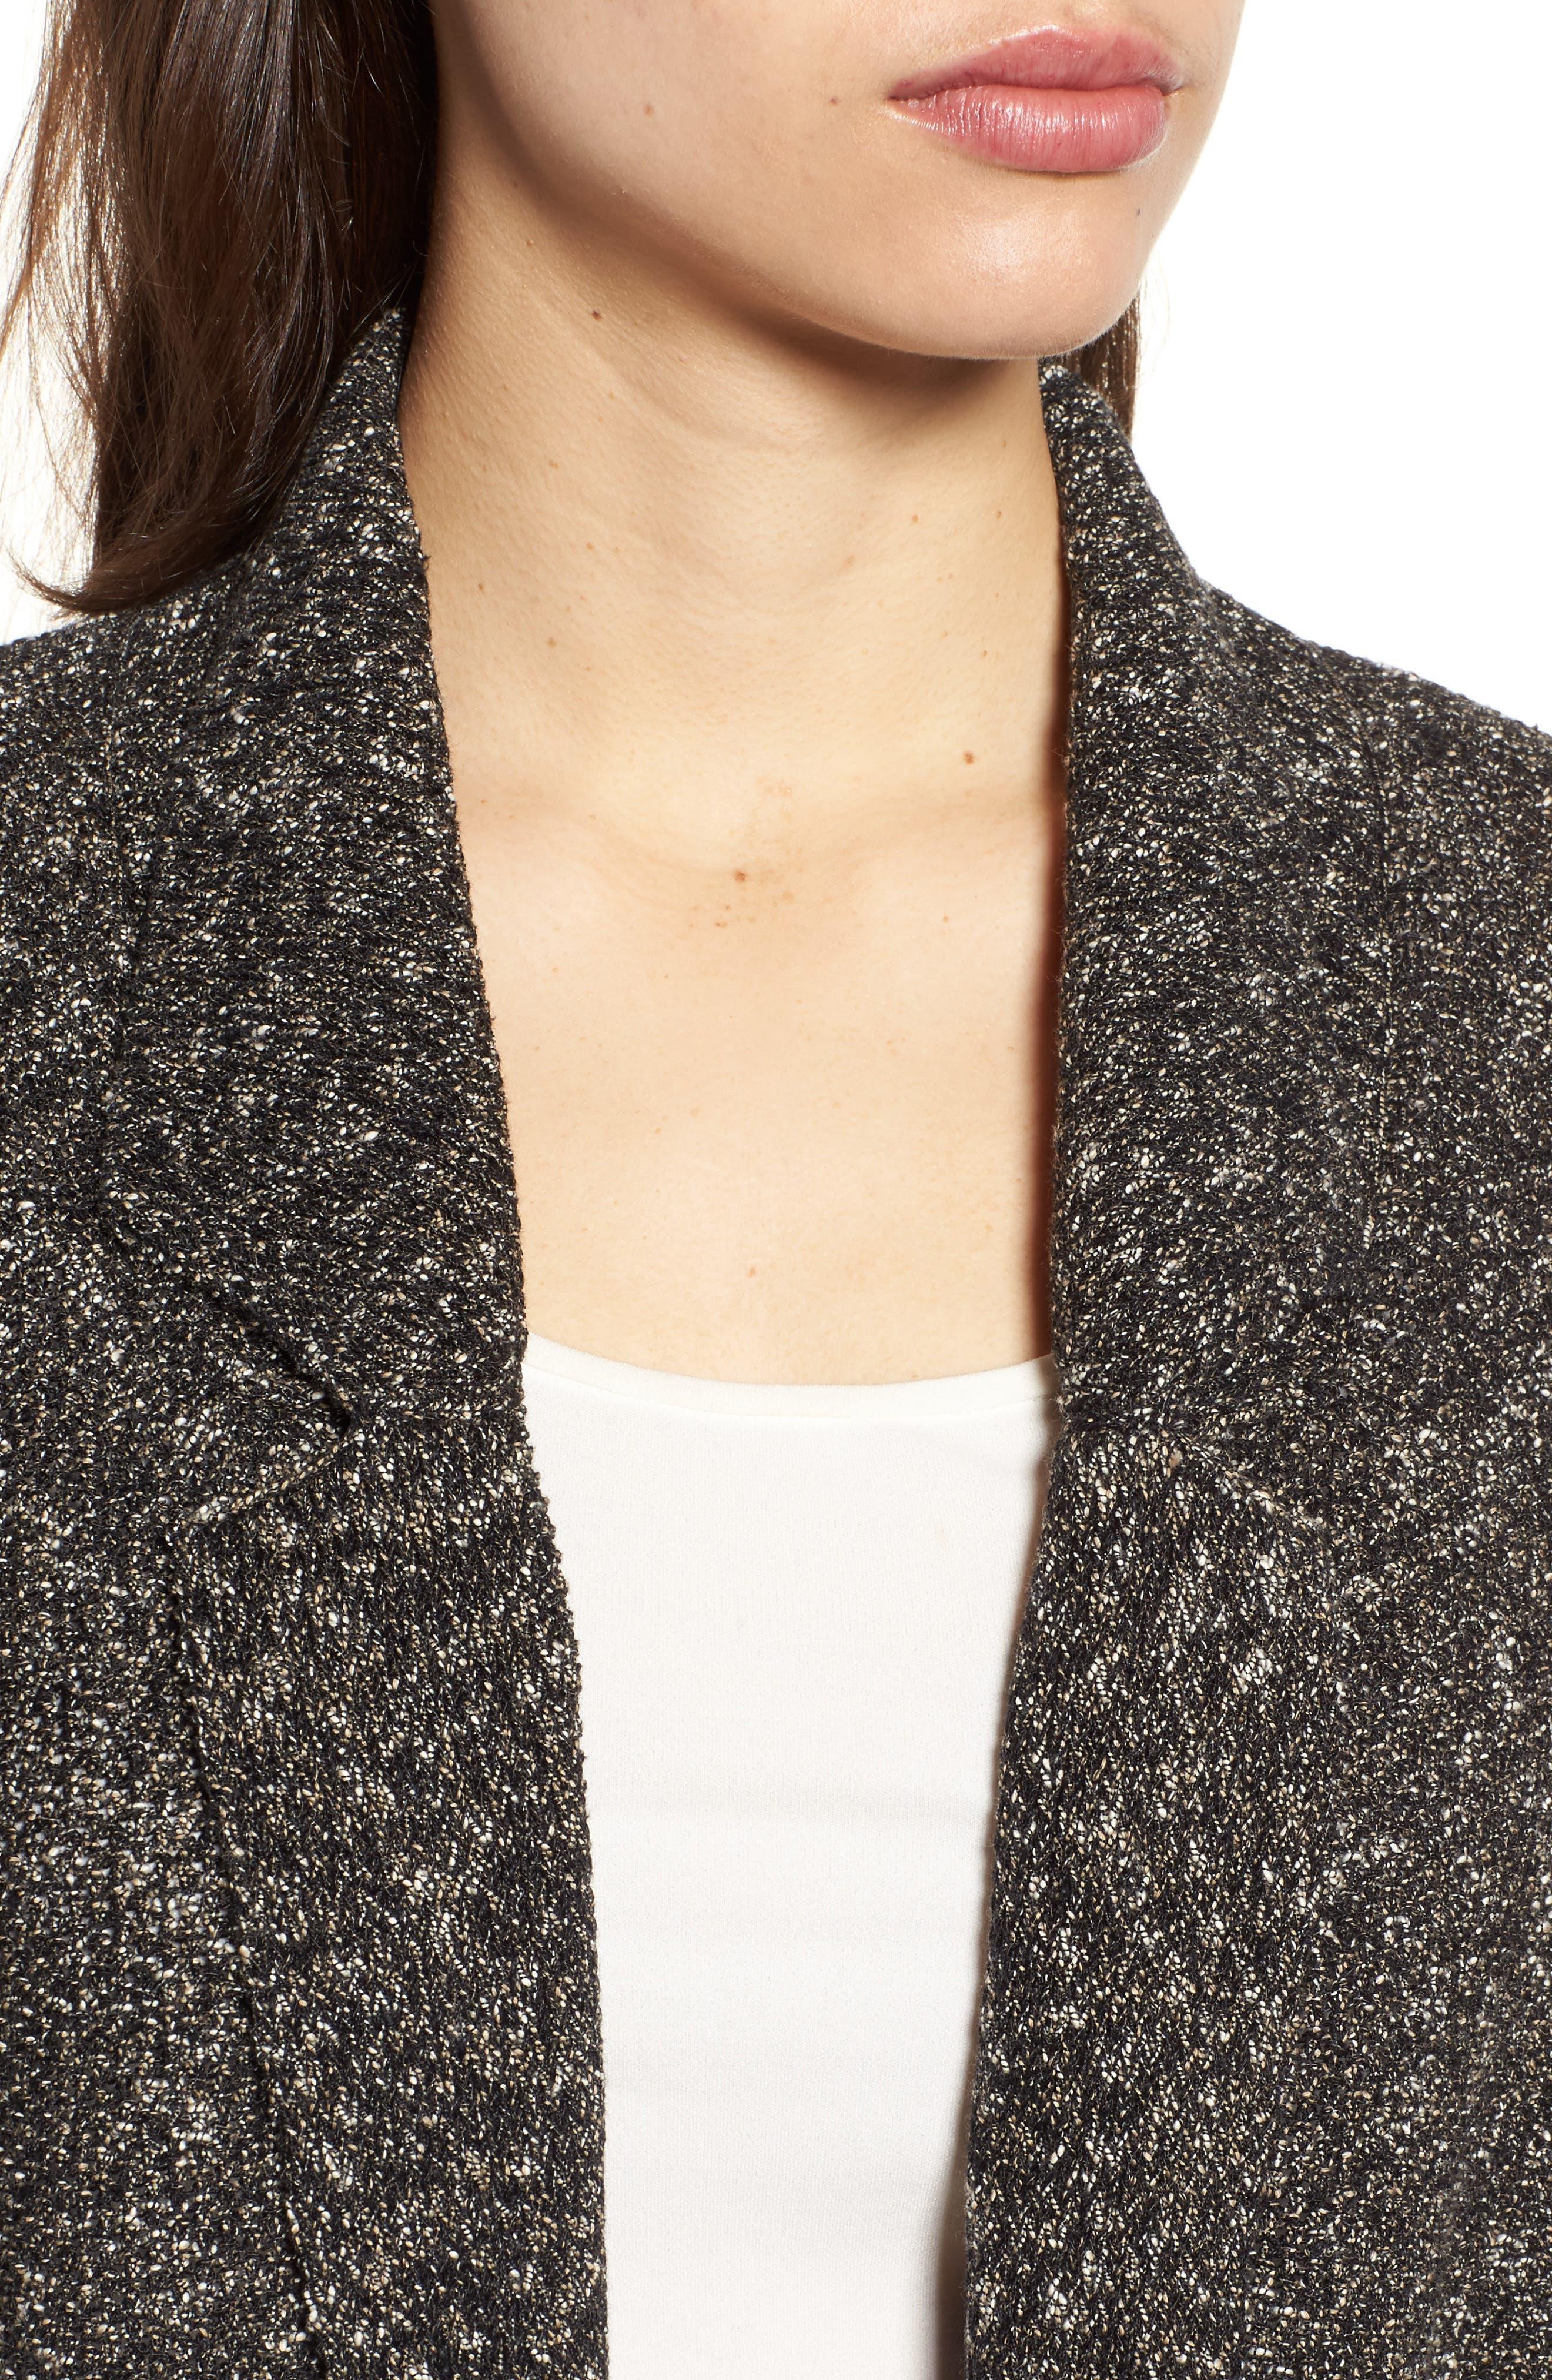 Tweed Sweater Jacket,                             Alternate thumbnail 4, color,                             Black